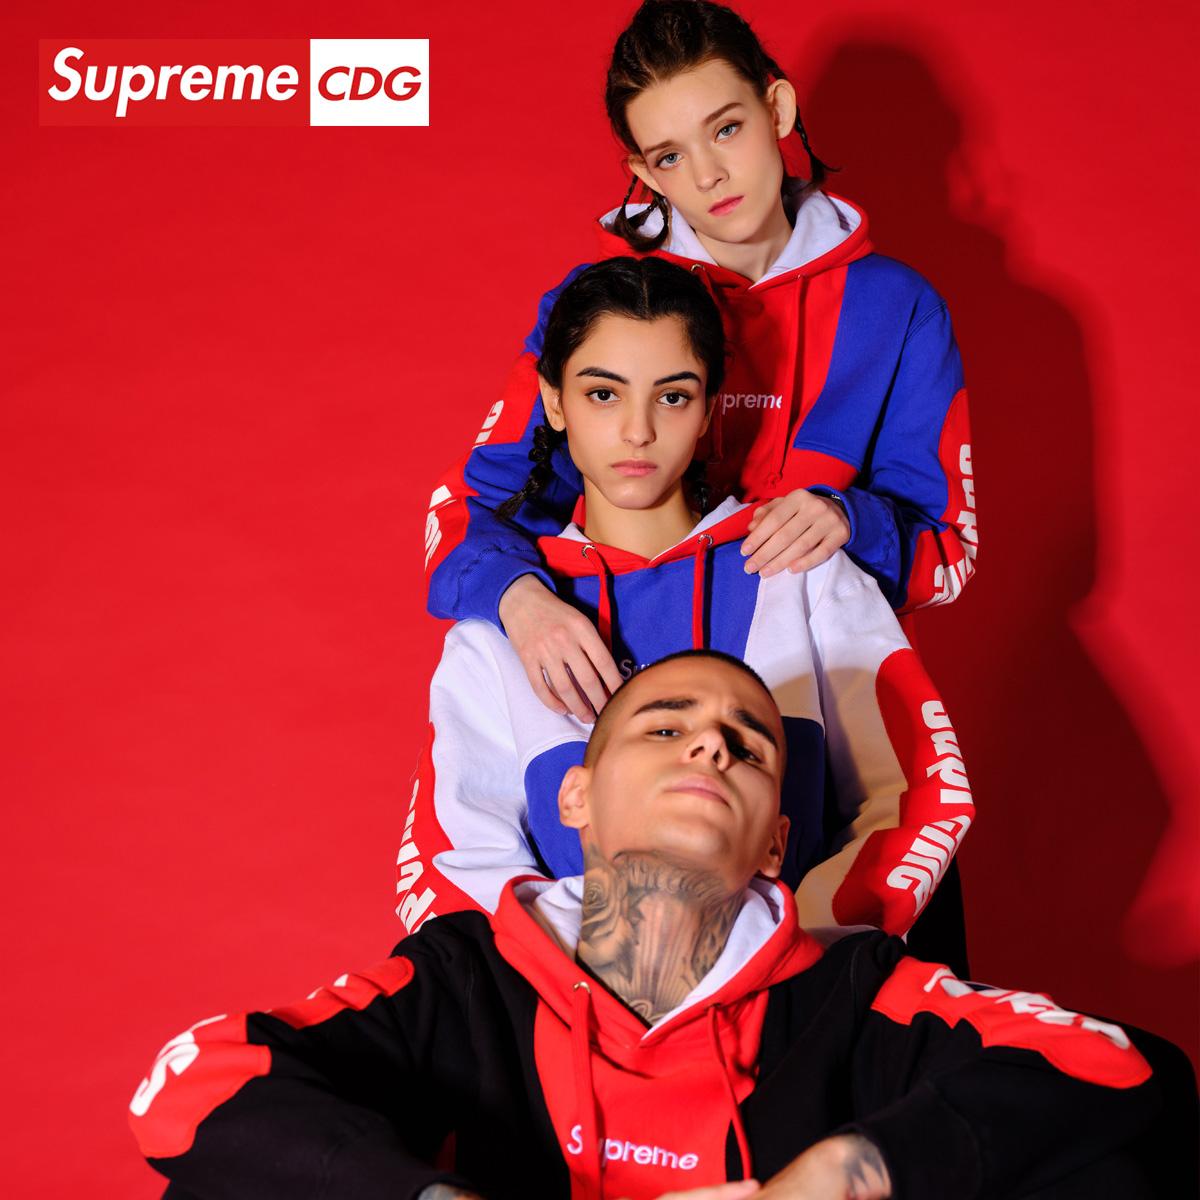 Supreme CDG 2020年春季新款印花字母情侣中性连帽卫衣男女款上衣